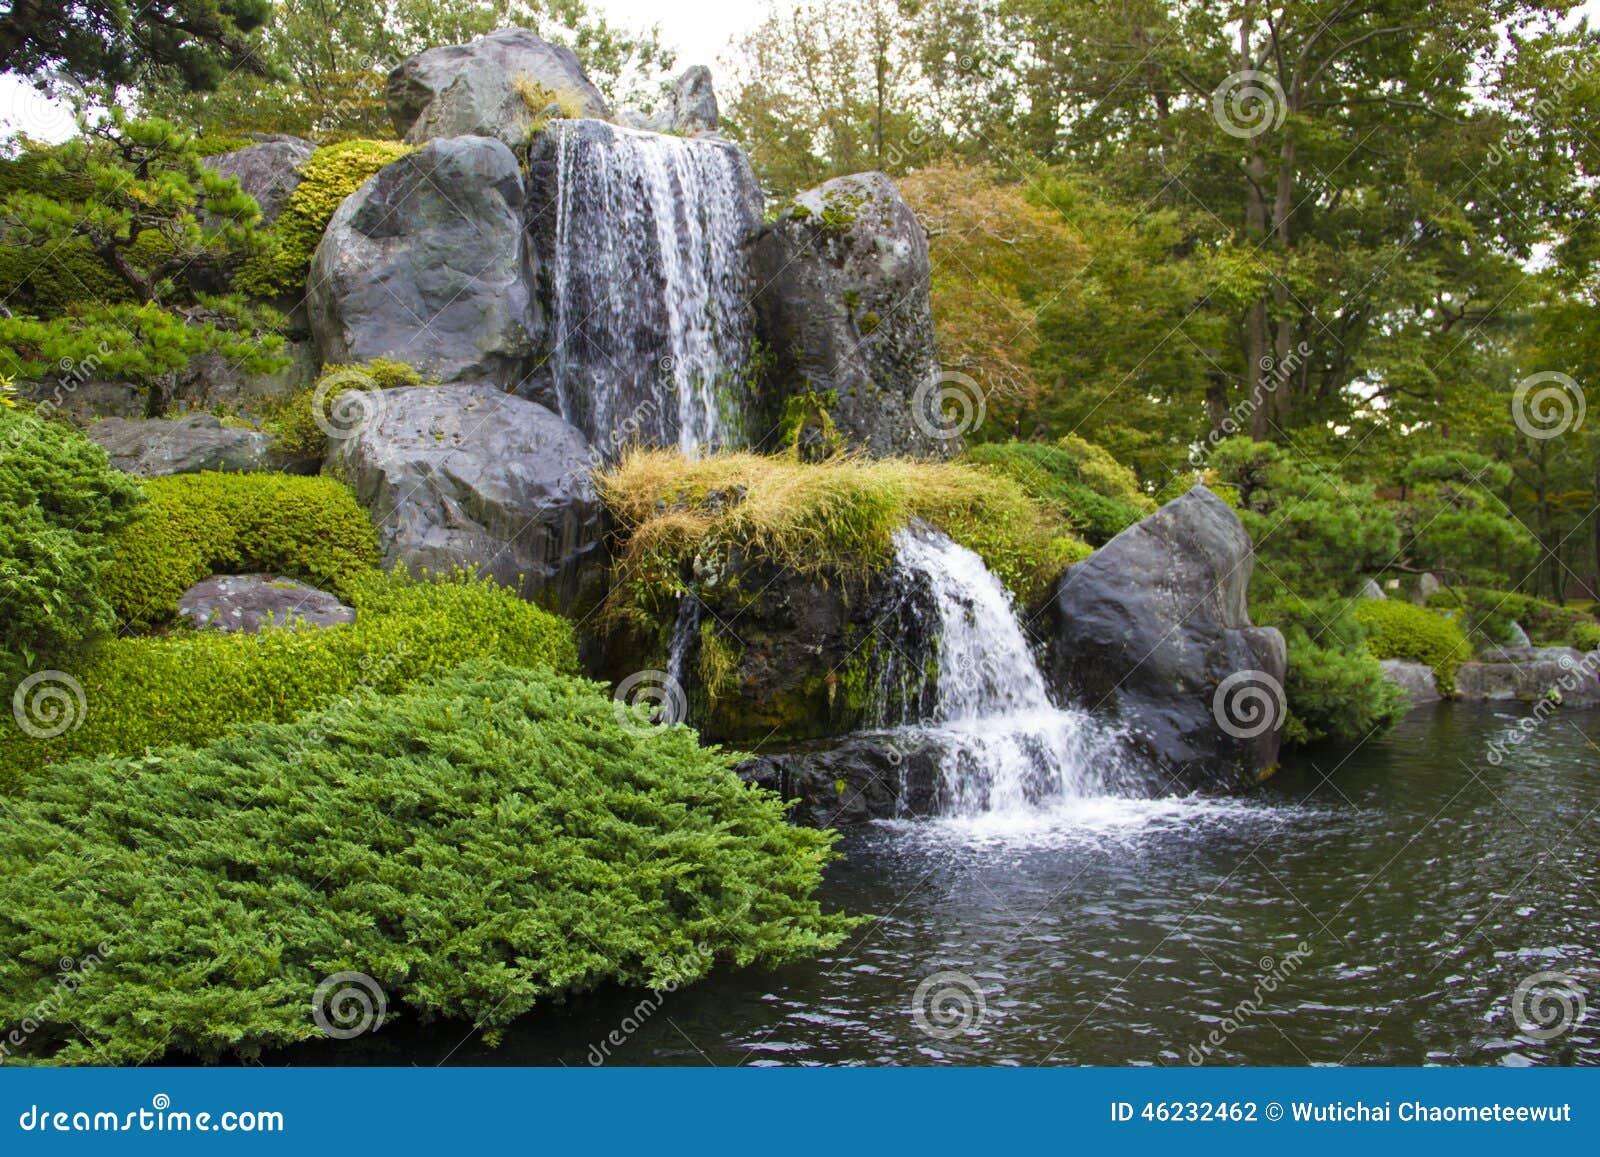 Waterval In Tuin : Waterval in de tuin ninfa lazio italië royalty vrije foto